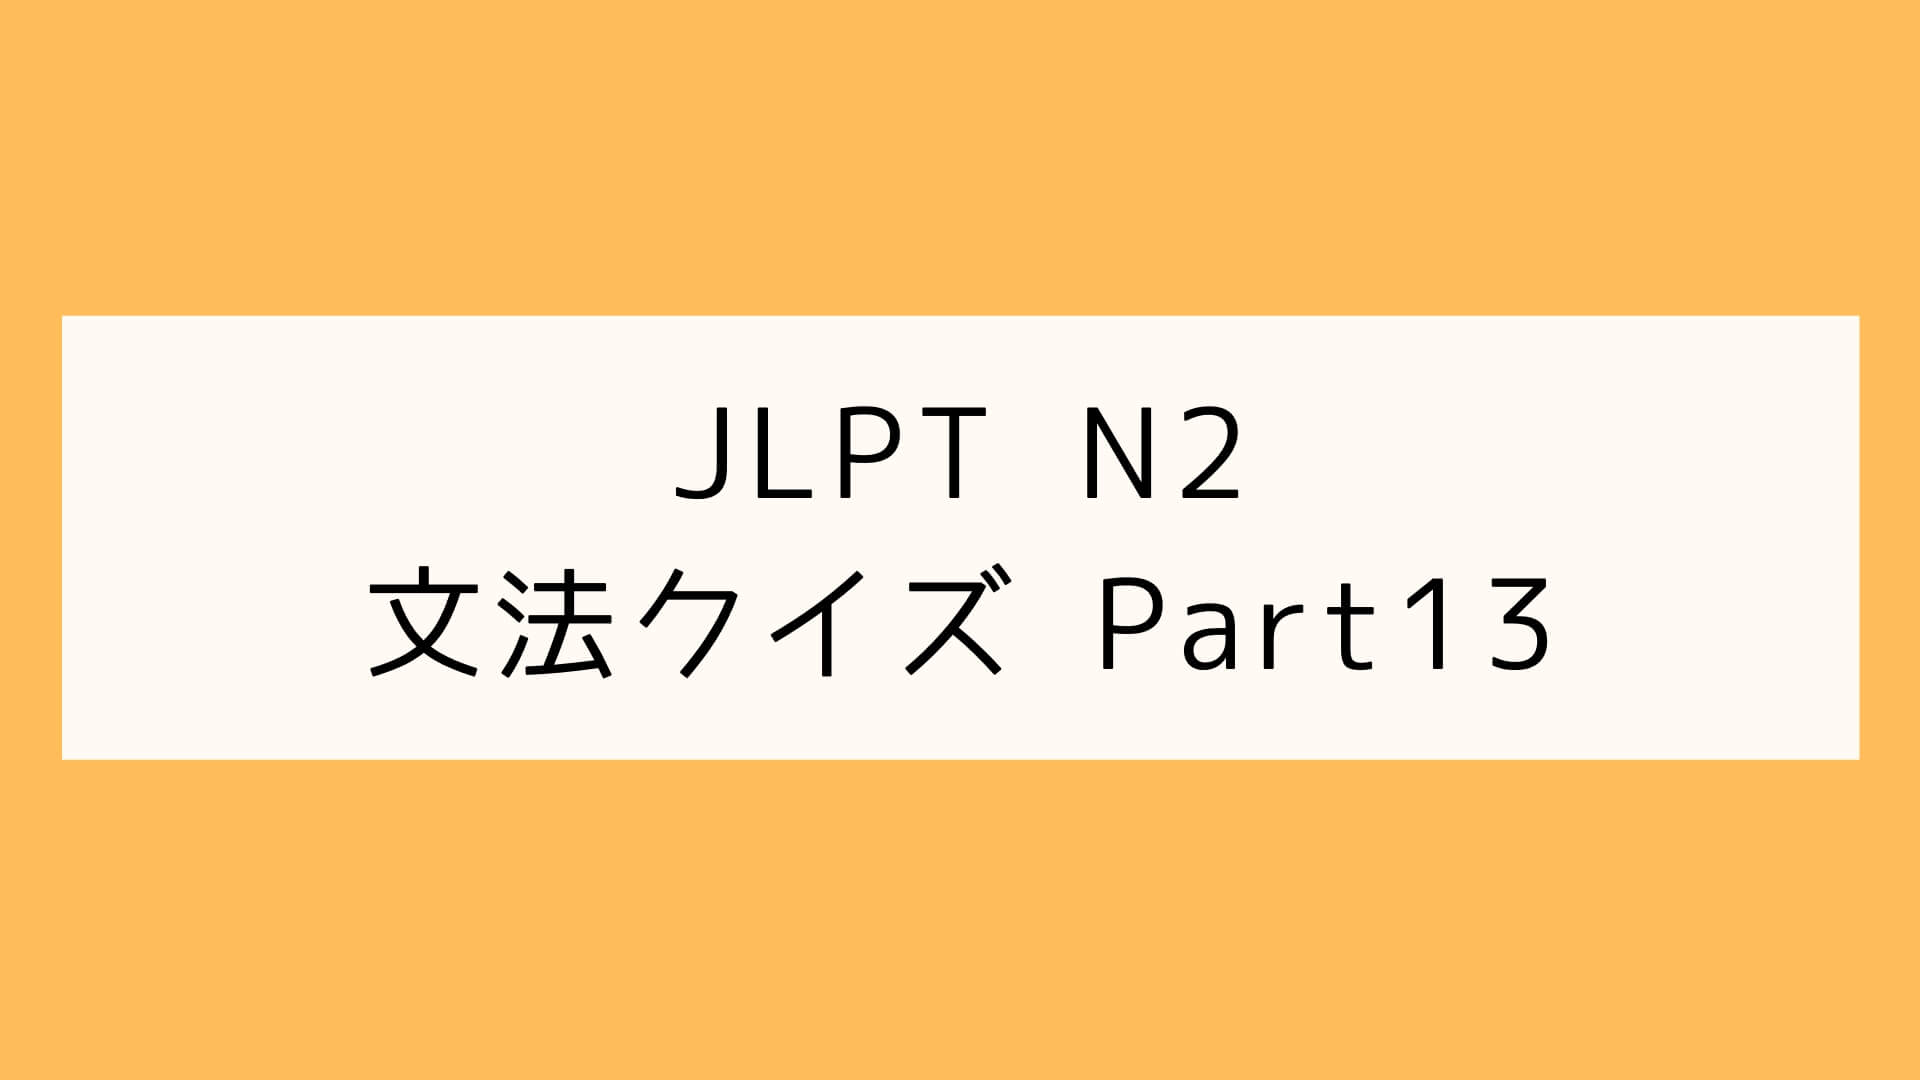 【JLPT N2】文法クイズ Part13